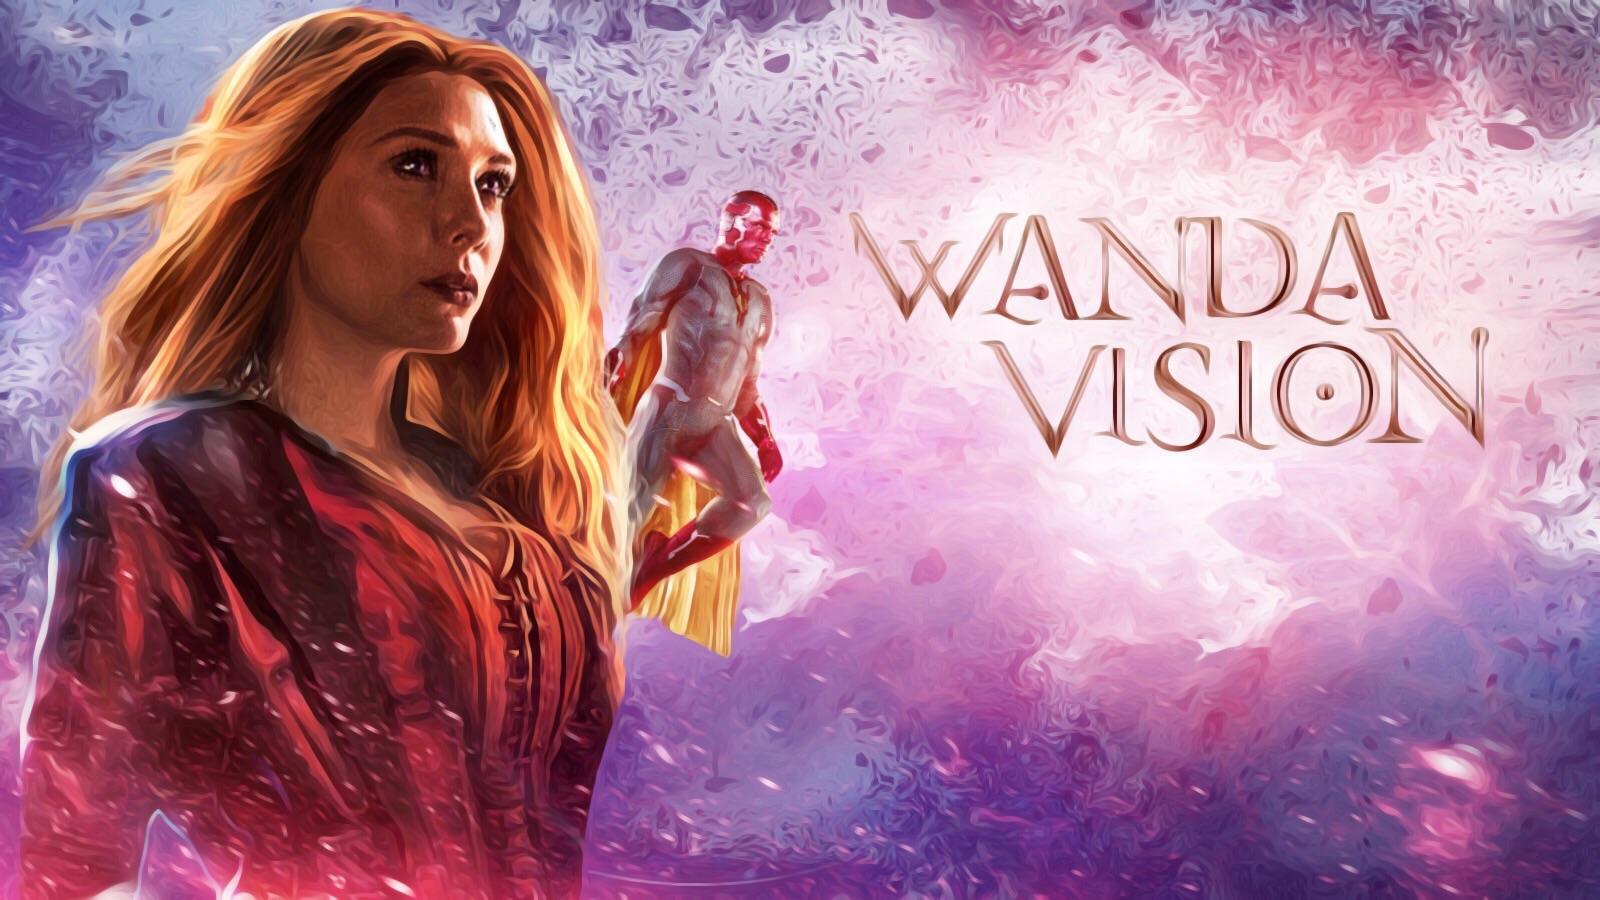 Wanda vision release date